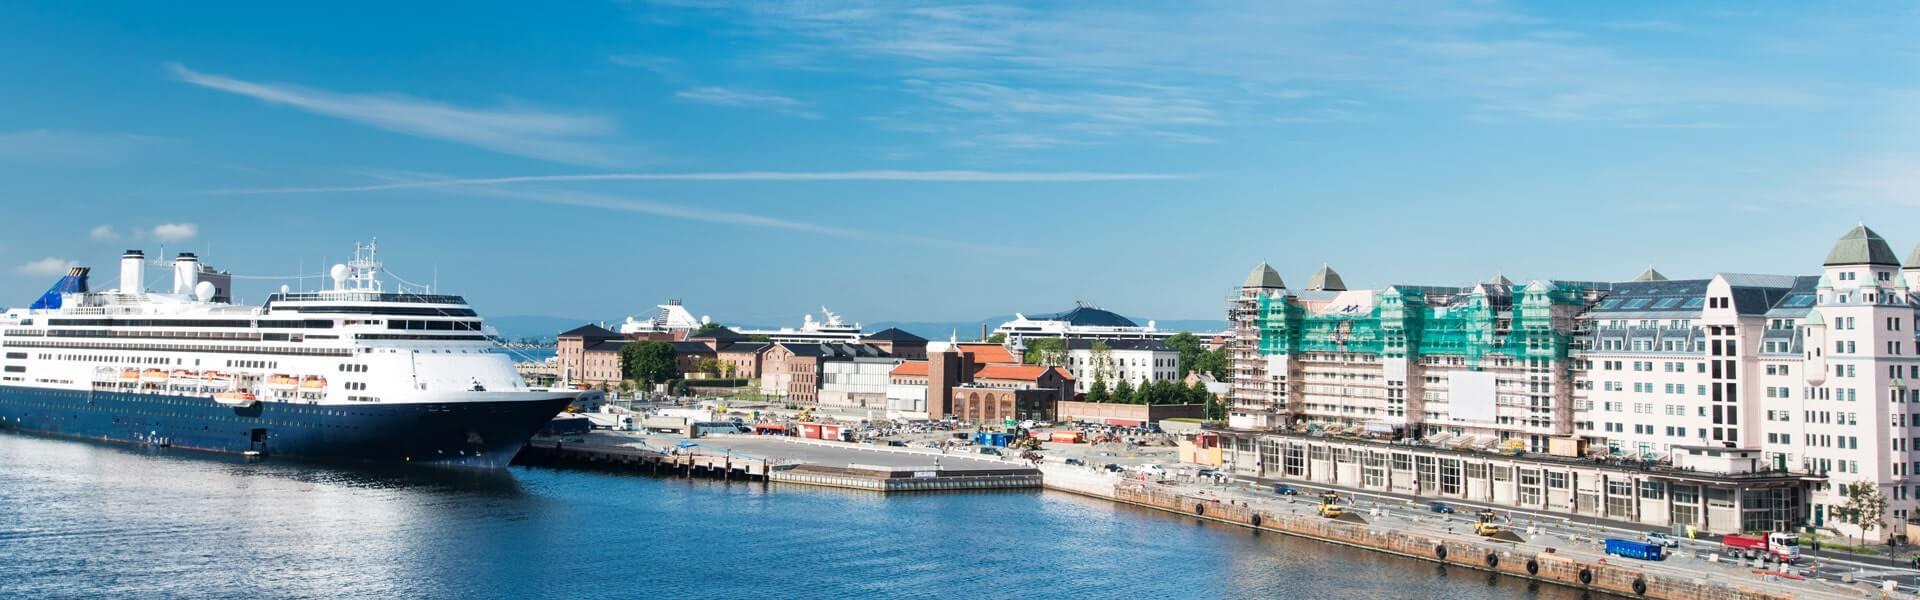 Incentive Reise nach Oslo mit b-ceed